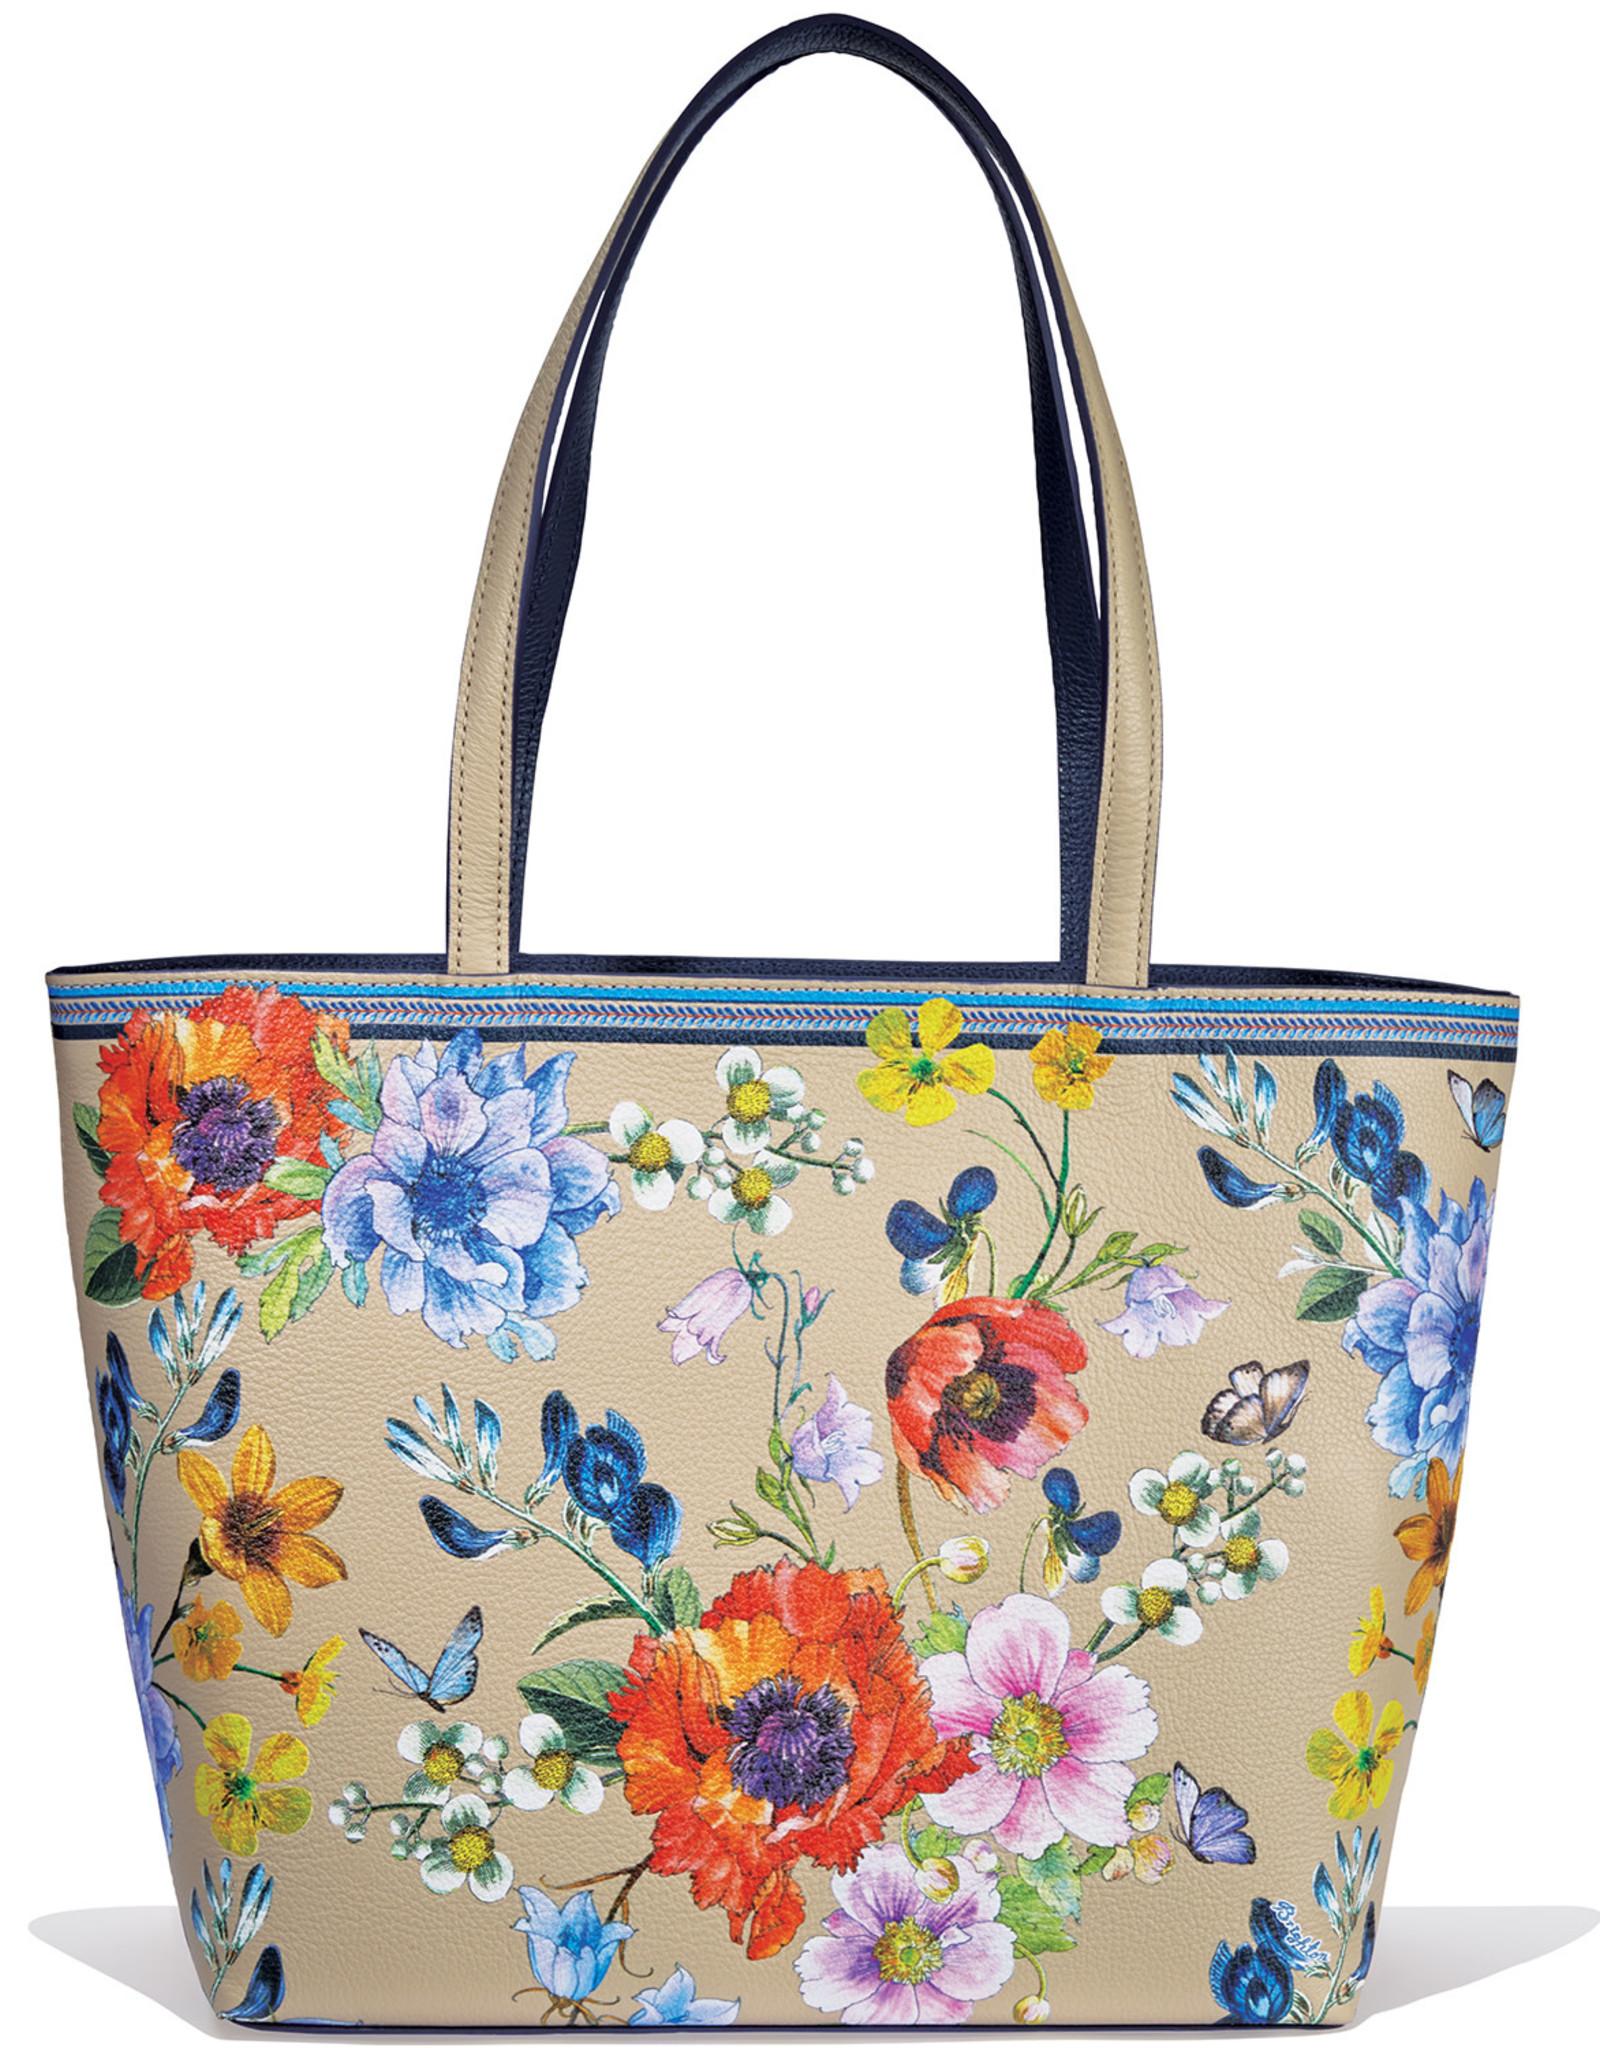 Brighton Brighton Handbag- Marnie Tote